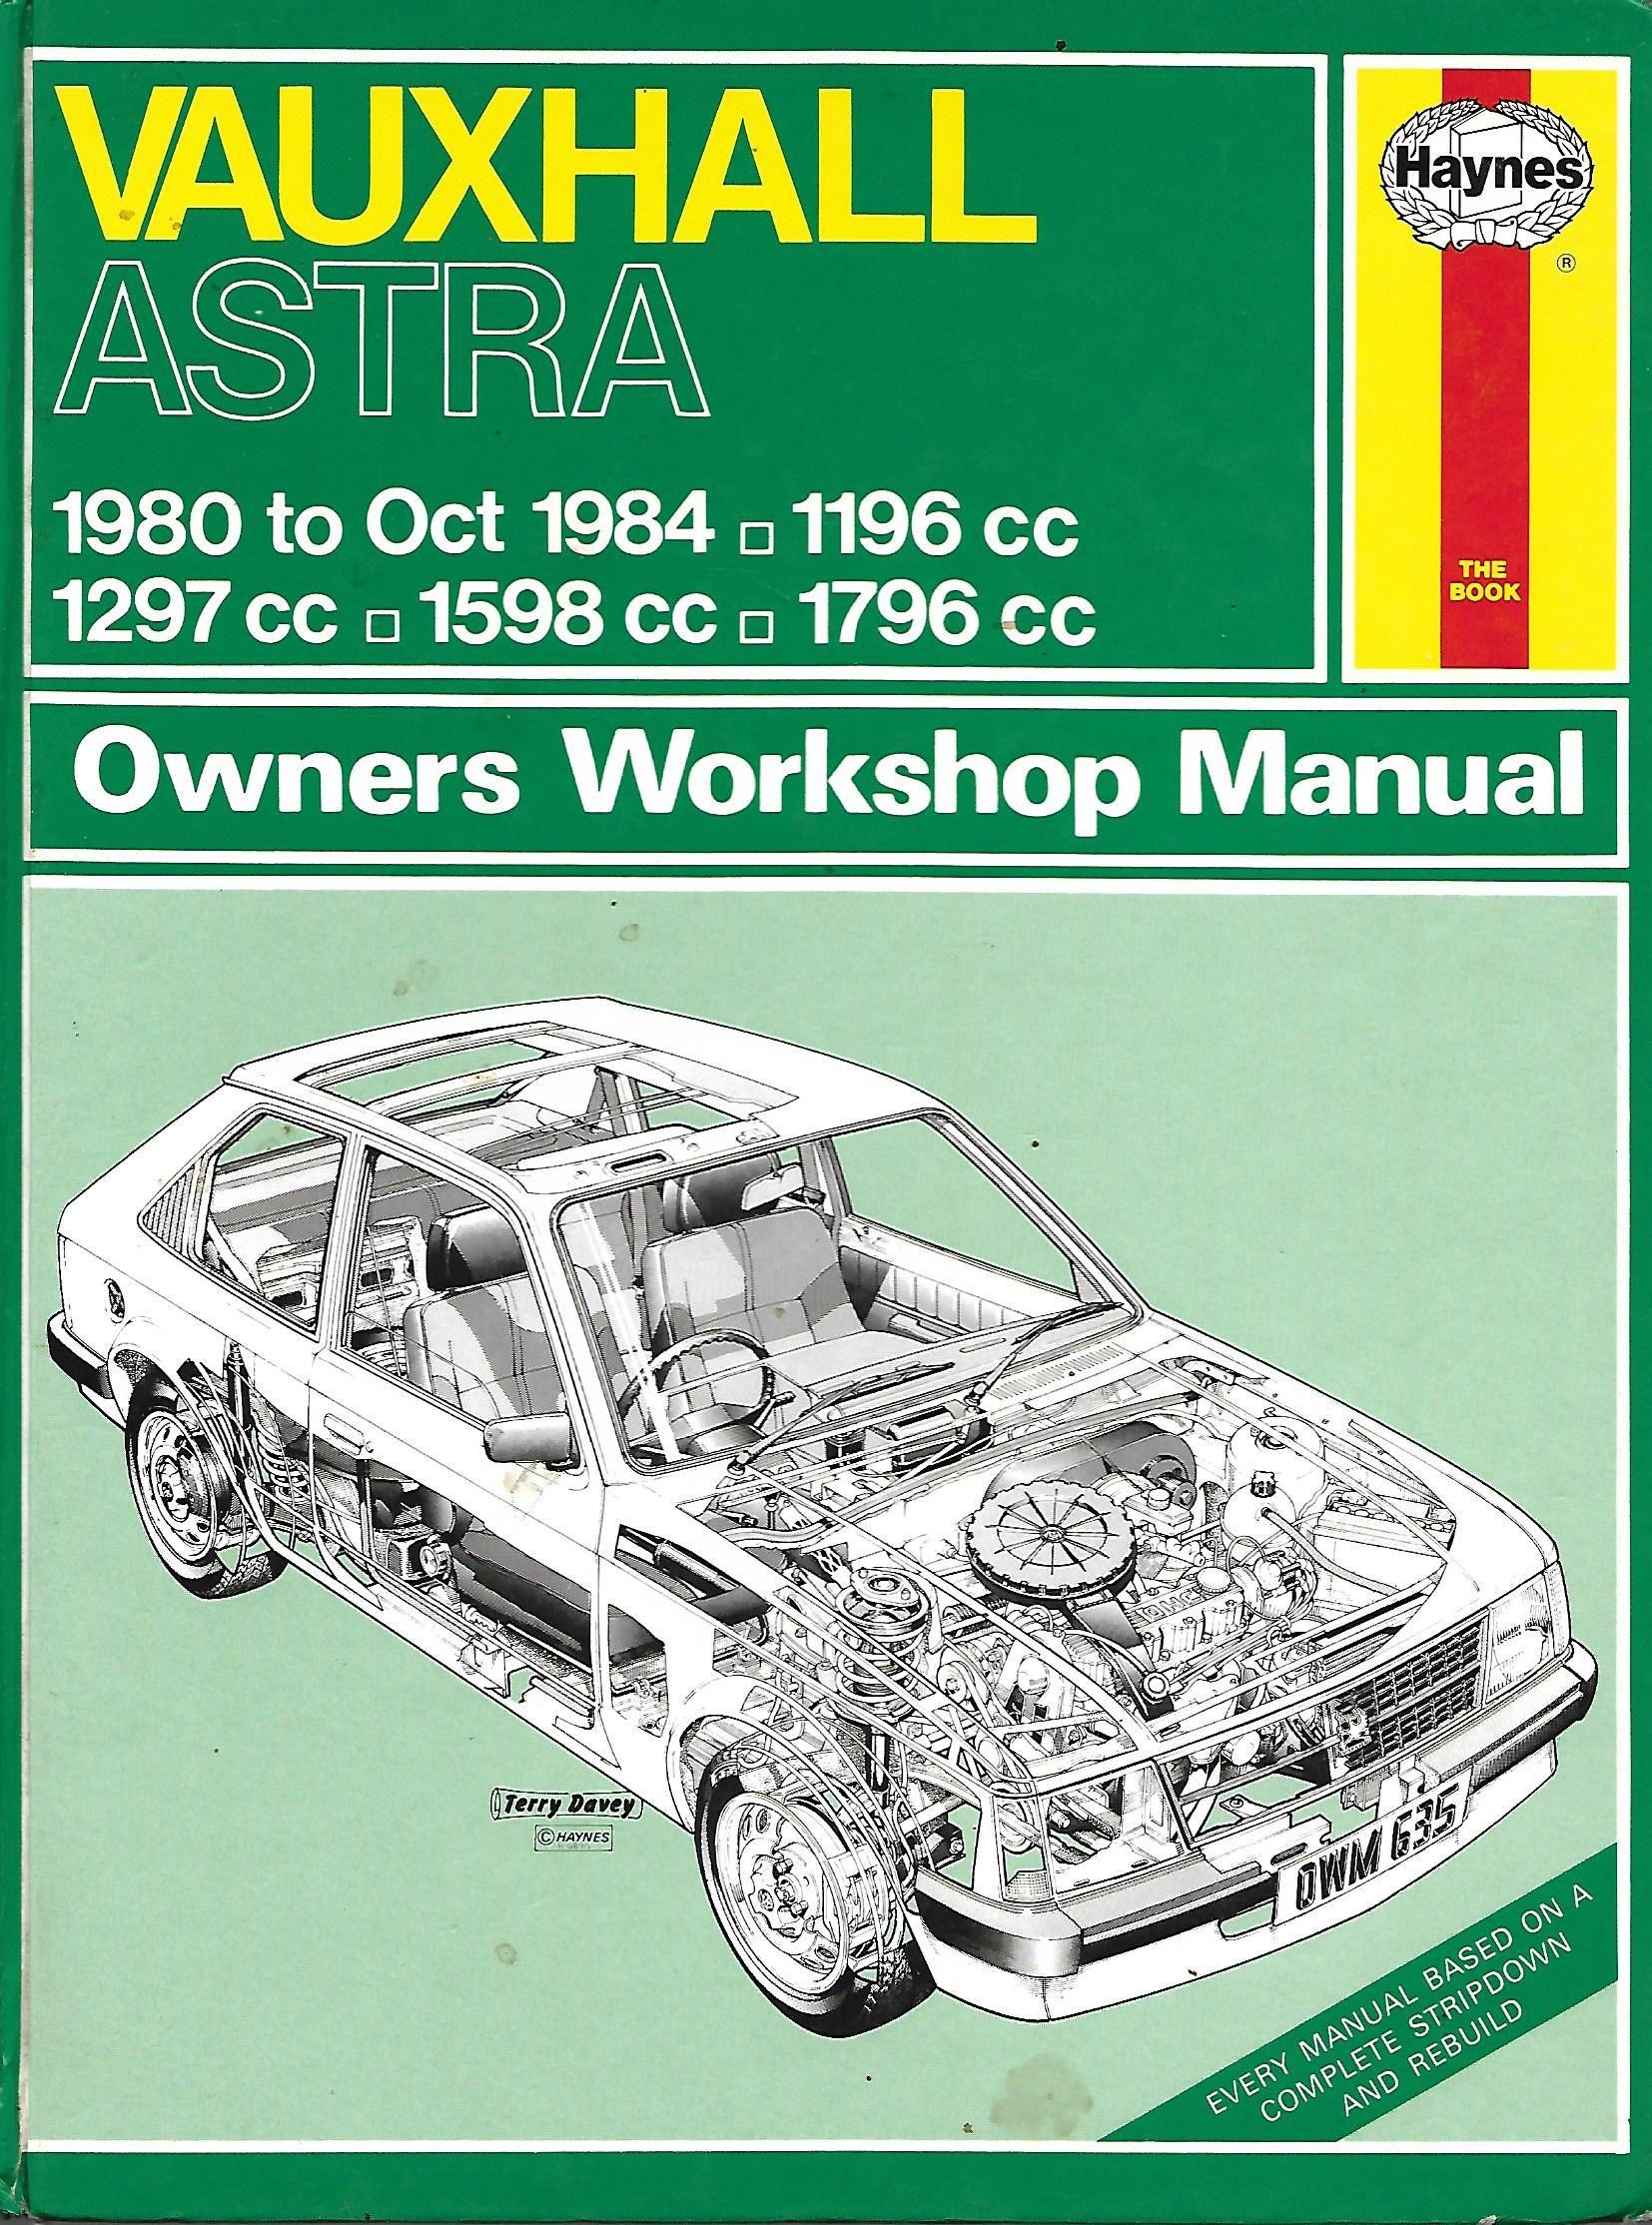 635 vauxhall astra 1980 oct 1984 haynes car manuals uk rh pinterest com Vehicle Manual Haynes Car Manuals Spreads